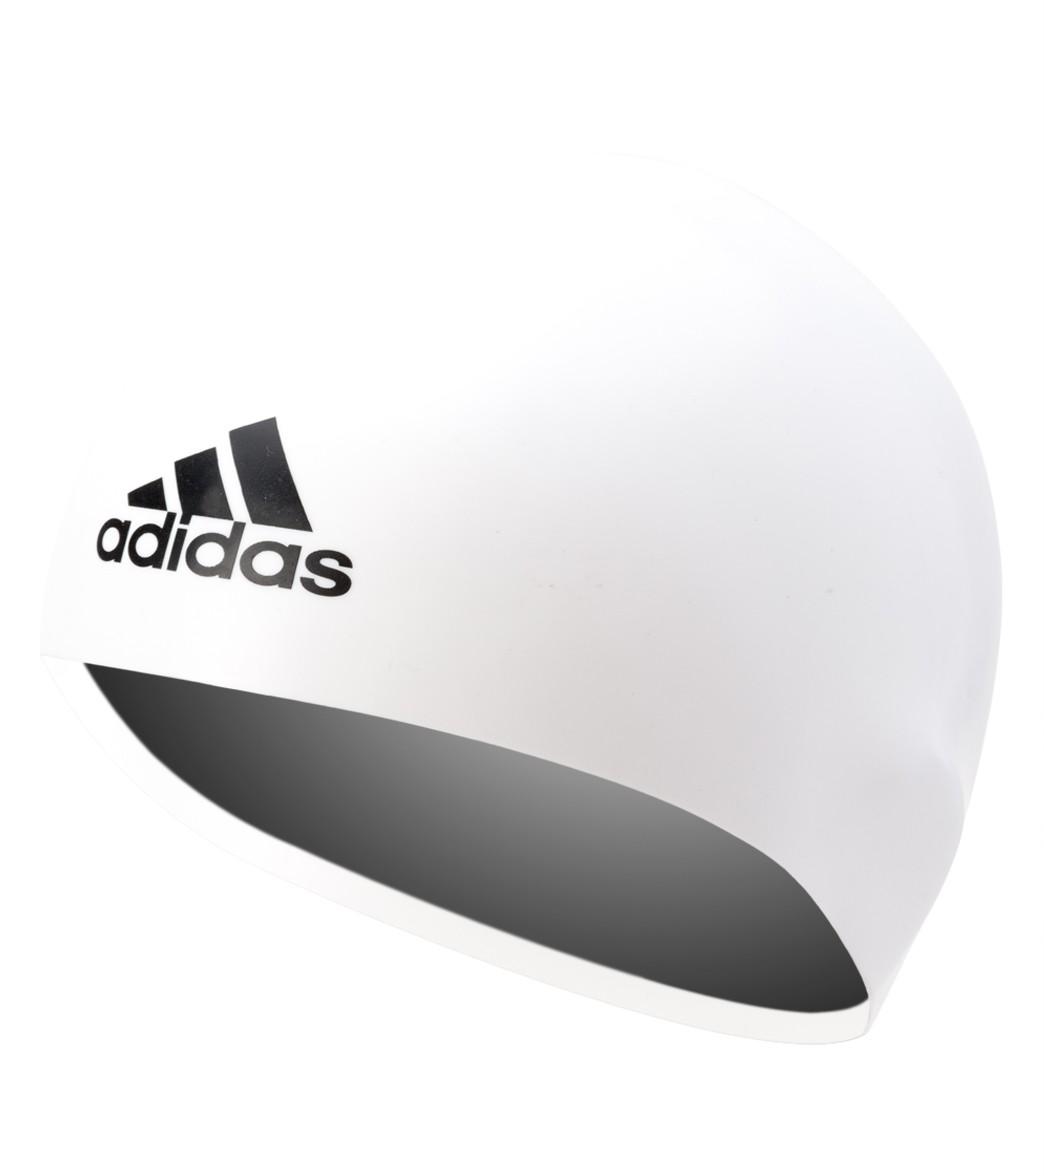 1d3df685e4fd9 Adidas Silicone 3D Dome Cap at SwimOutlet.com